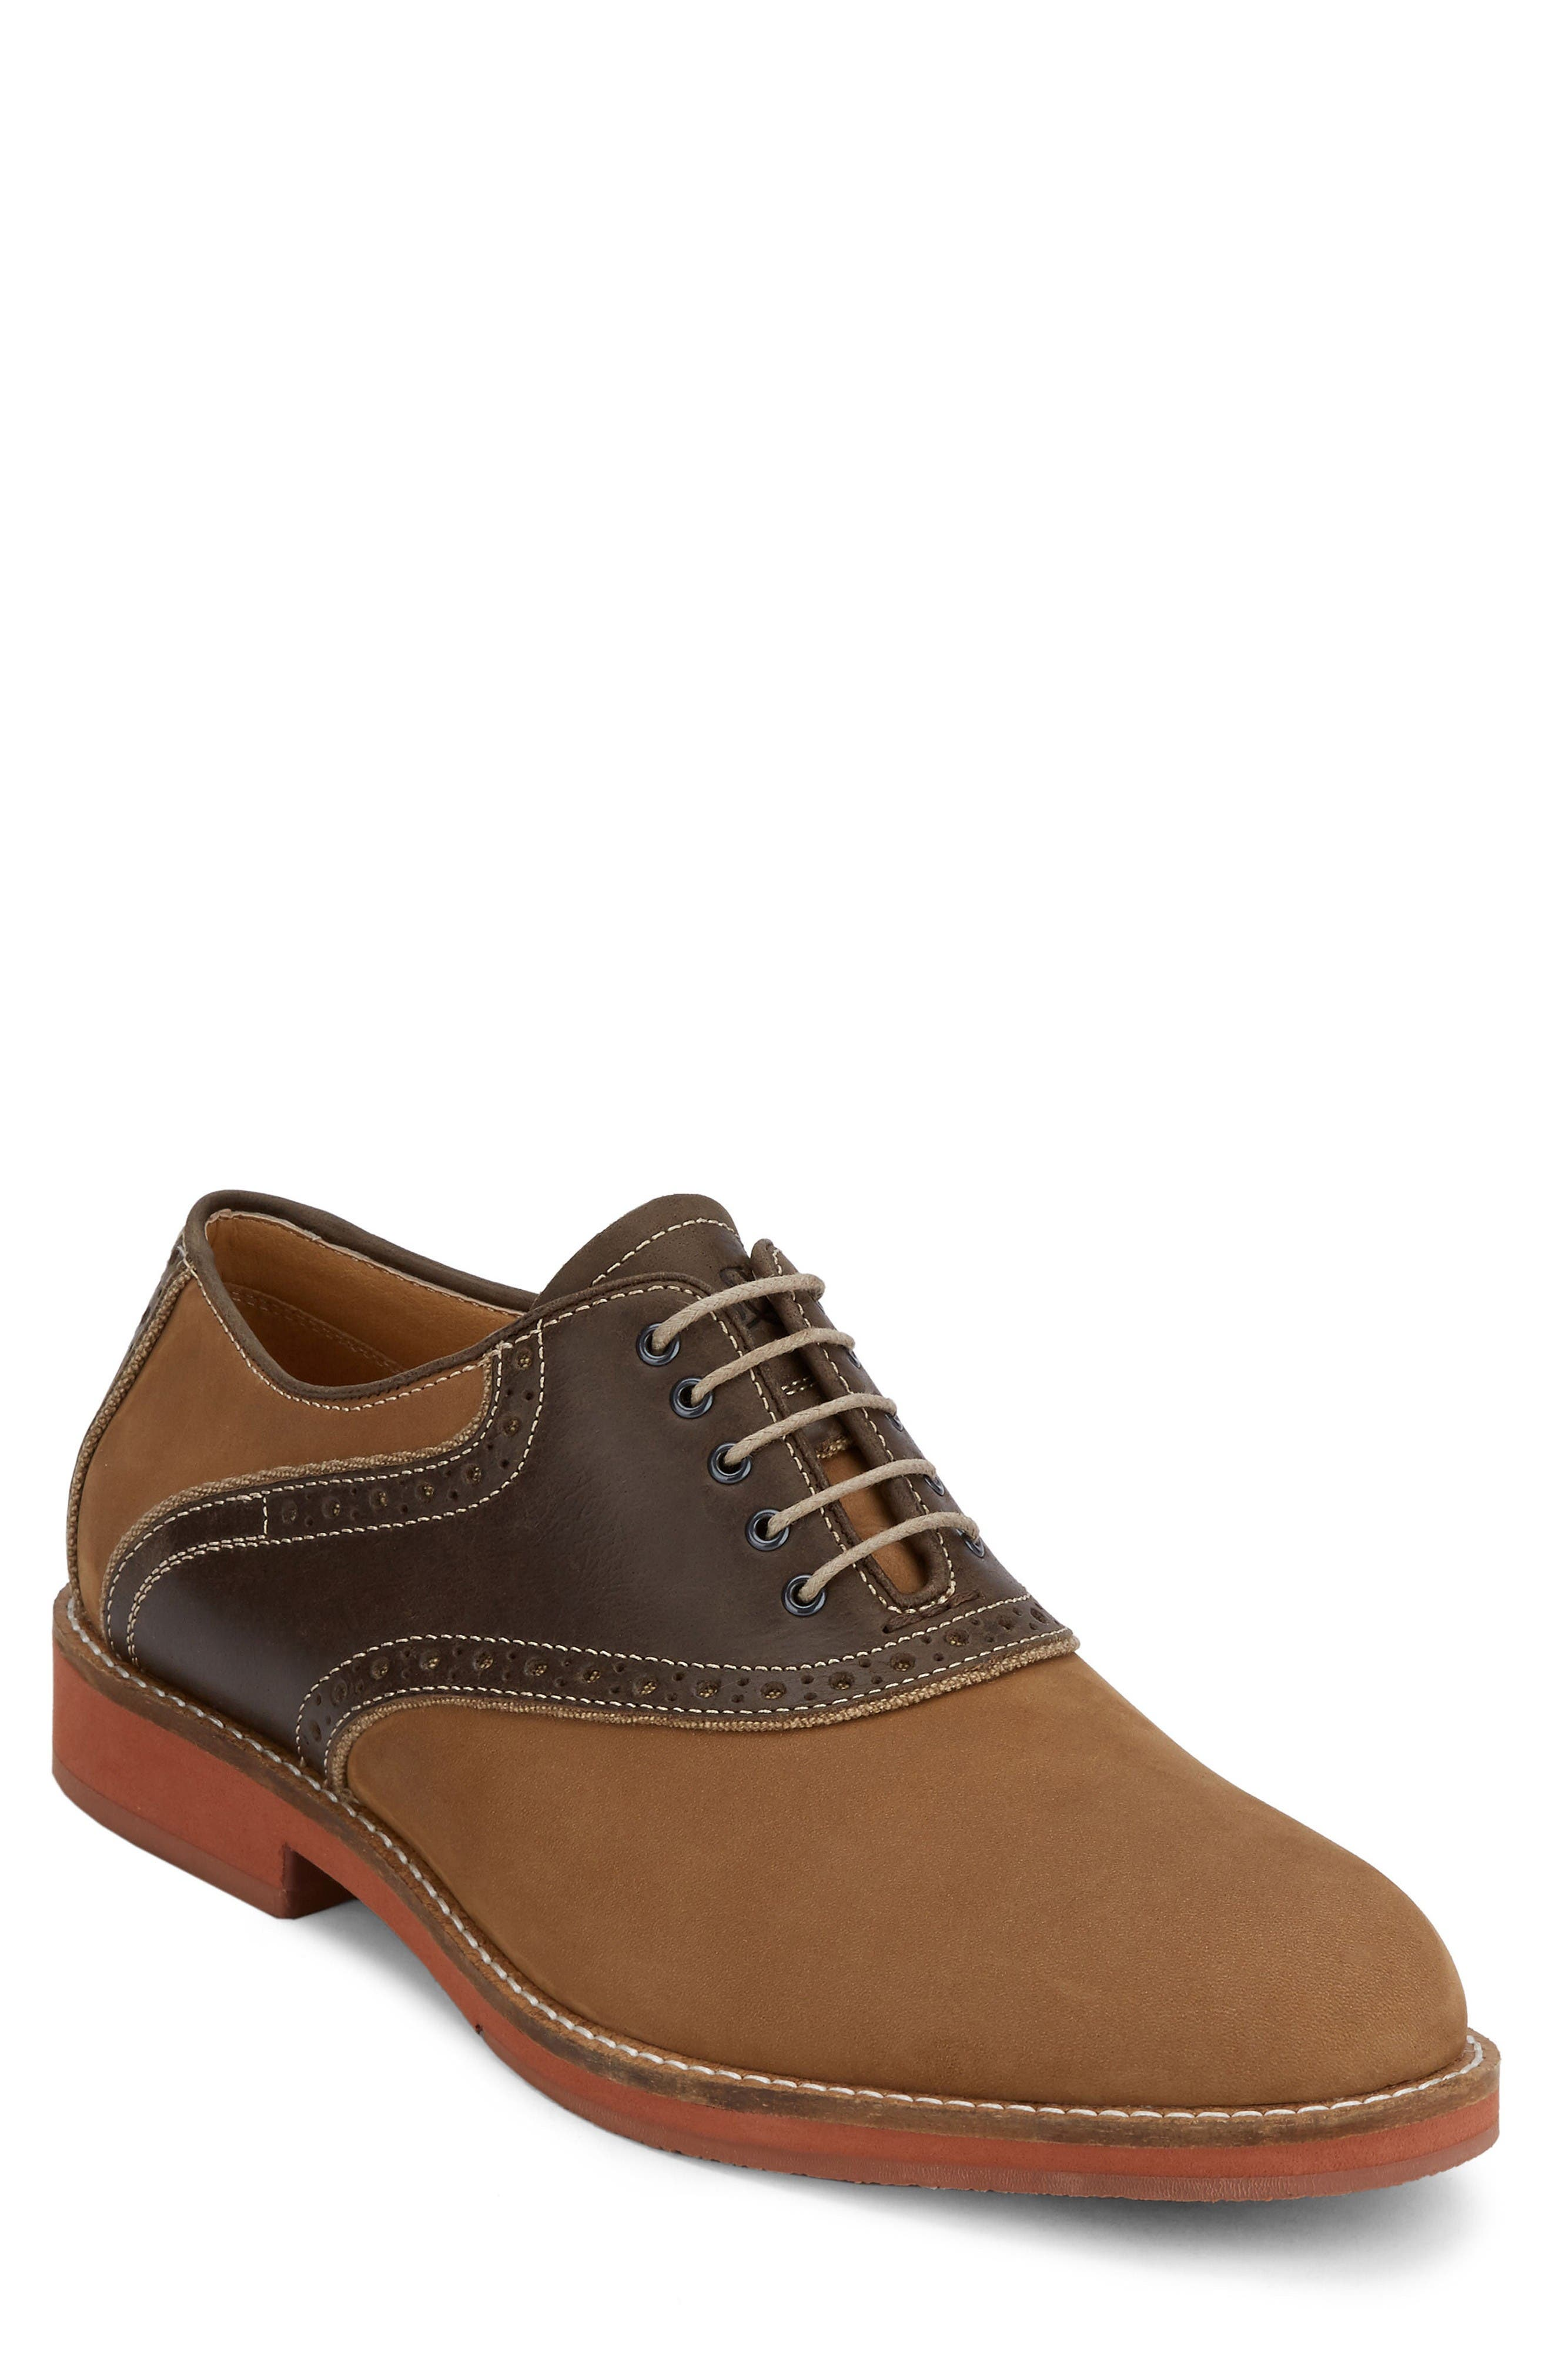 Alternate Image 1 Selected - G.H. Bass & Co. Noah Saddle Shoe (Men)